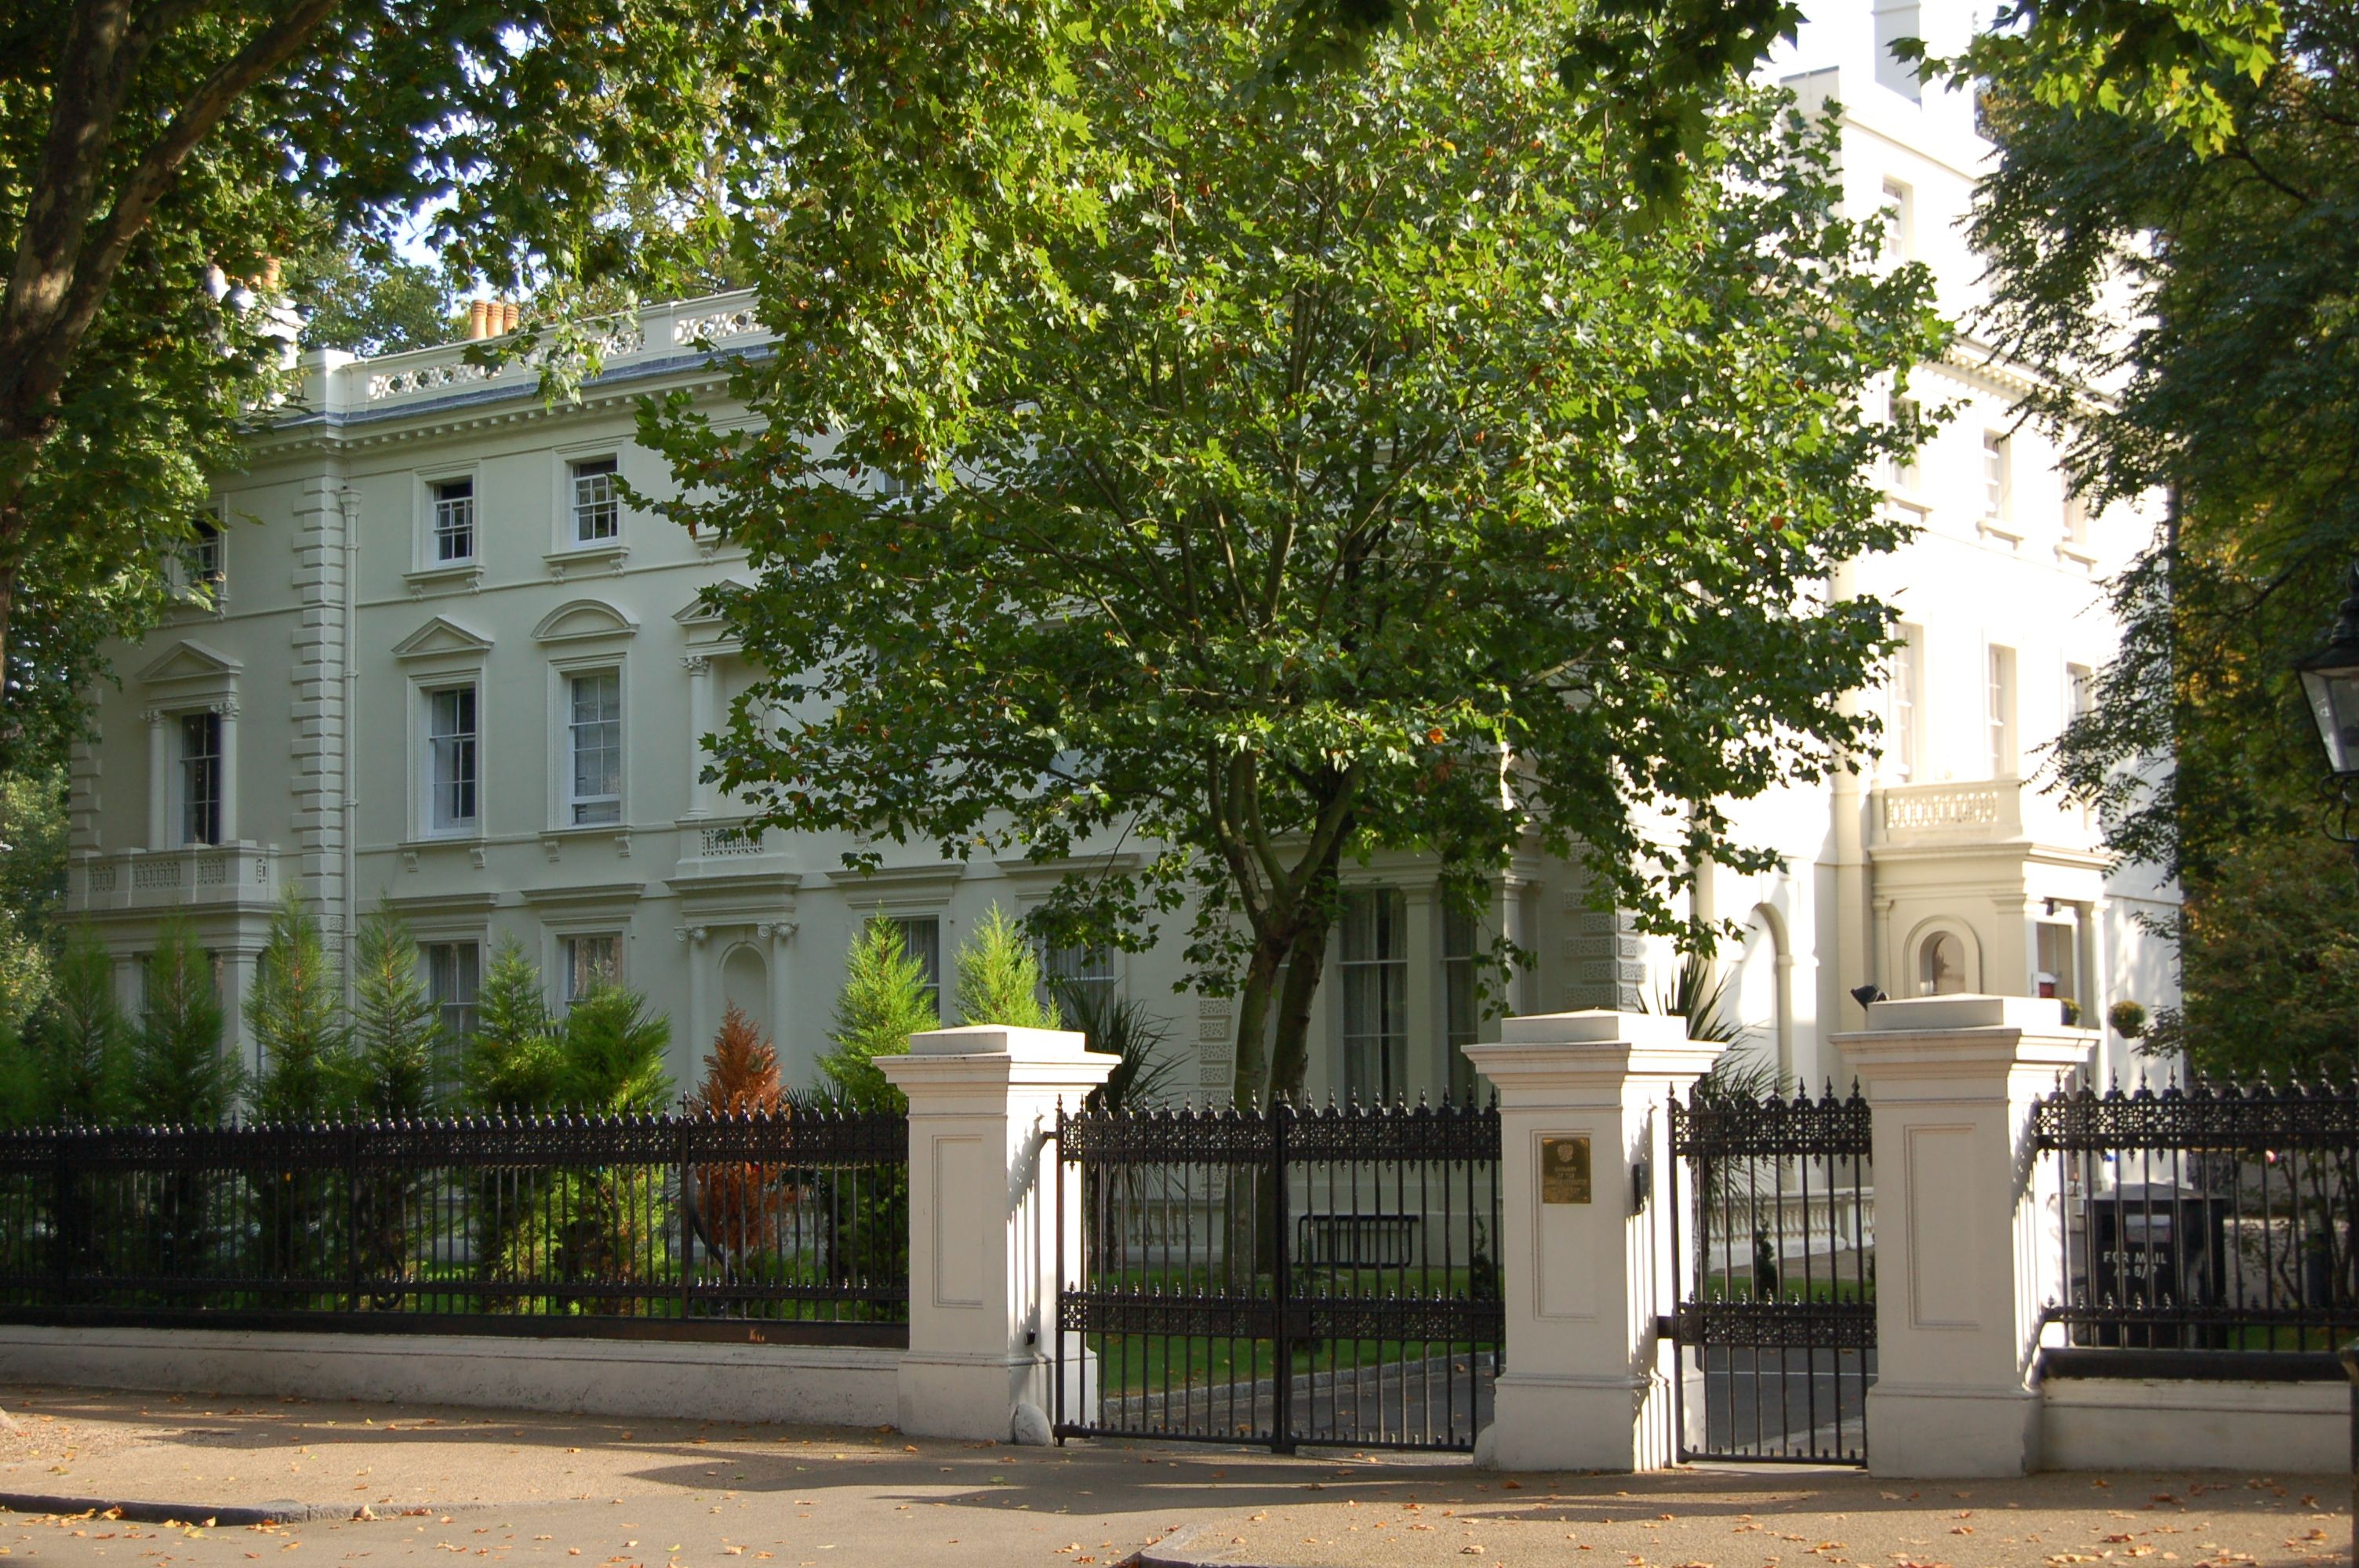 02003d9d7eadd6ad27a57cff2cad5c3b - Kensington Palace Gardens London Real Estate